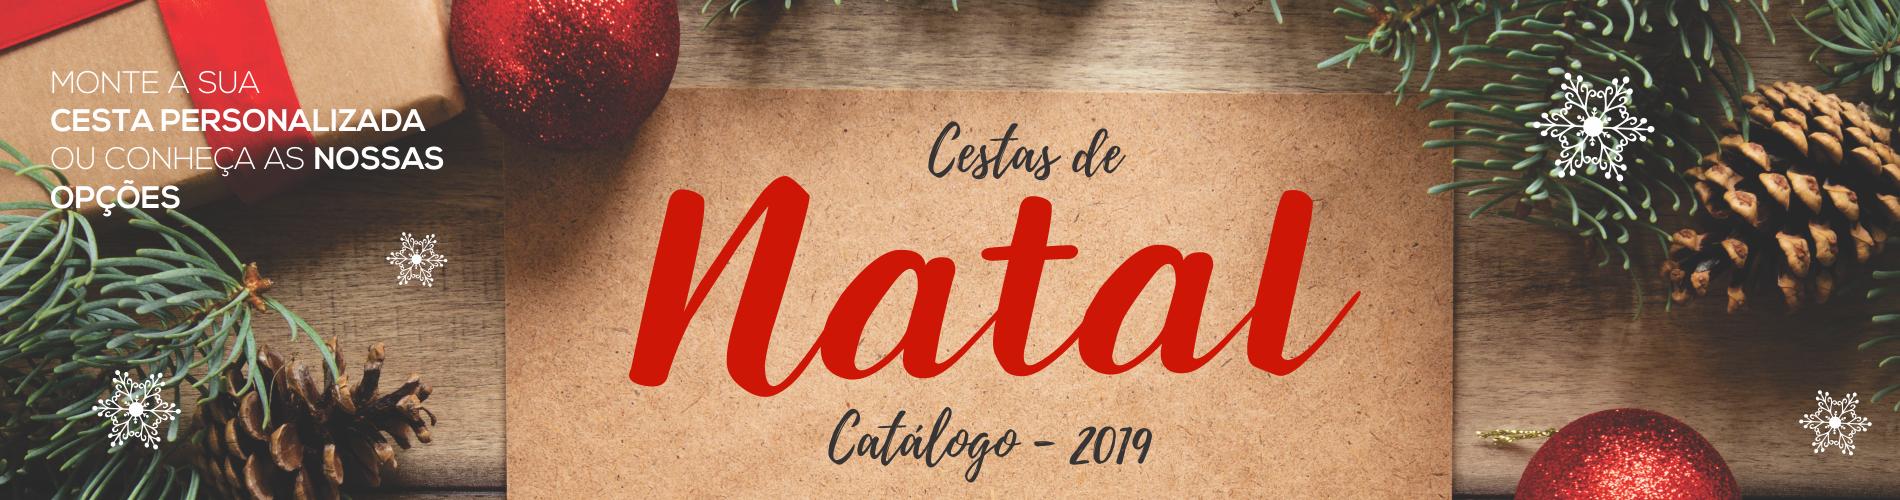 CESTA DE NATAL